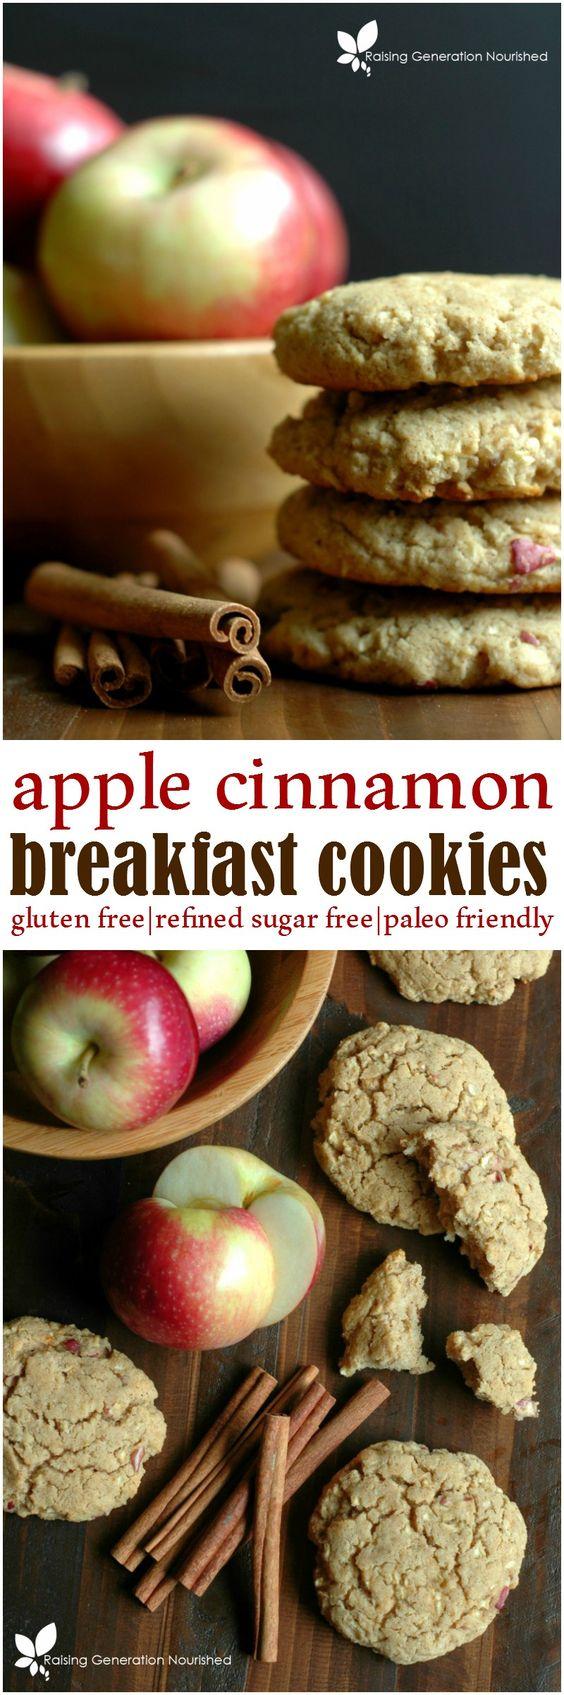 Healthy Apple Cinnamon Breakfast Cookies :: Refined Sugar Free & Gluten…: